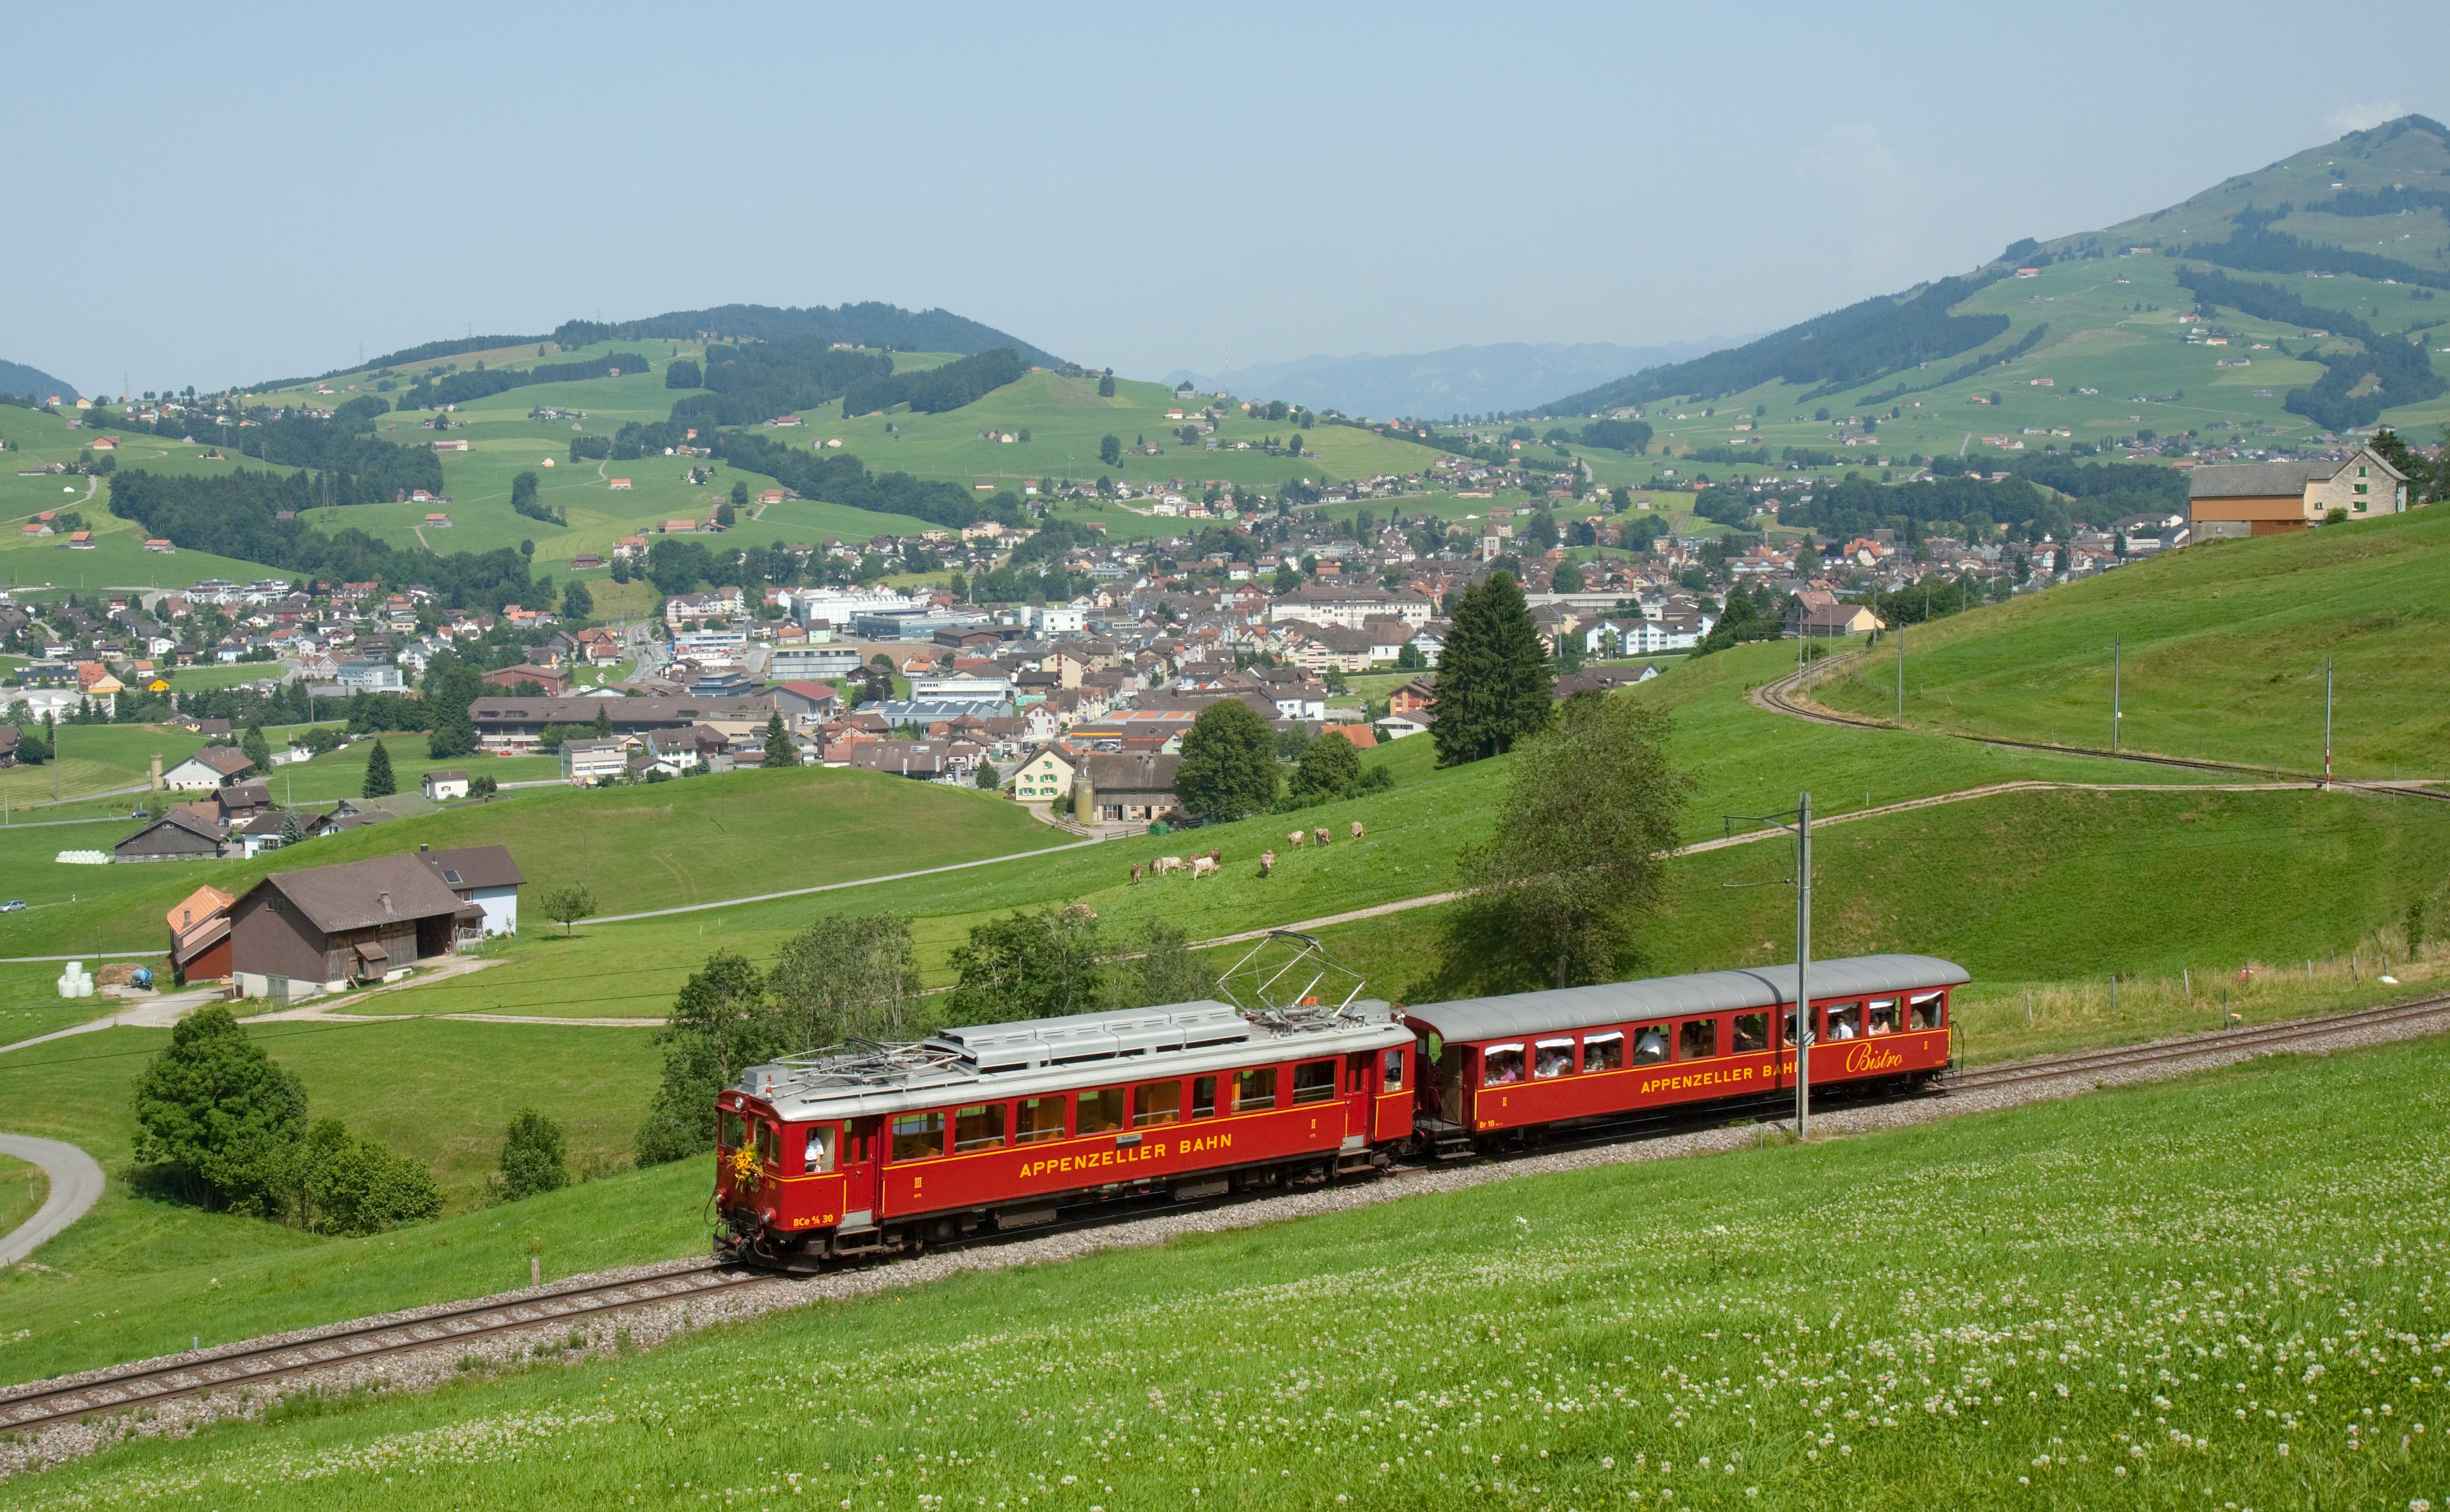 AB_BCe_4-4_oberhalb_Appenzell.jpg